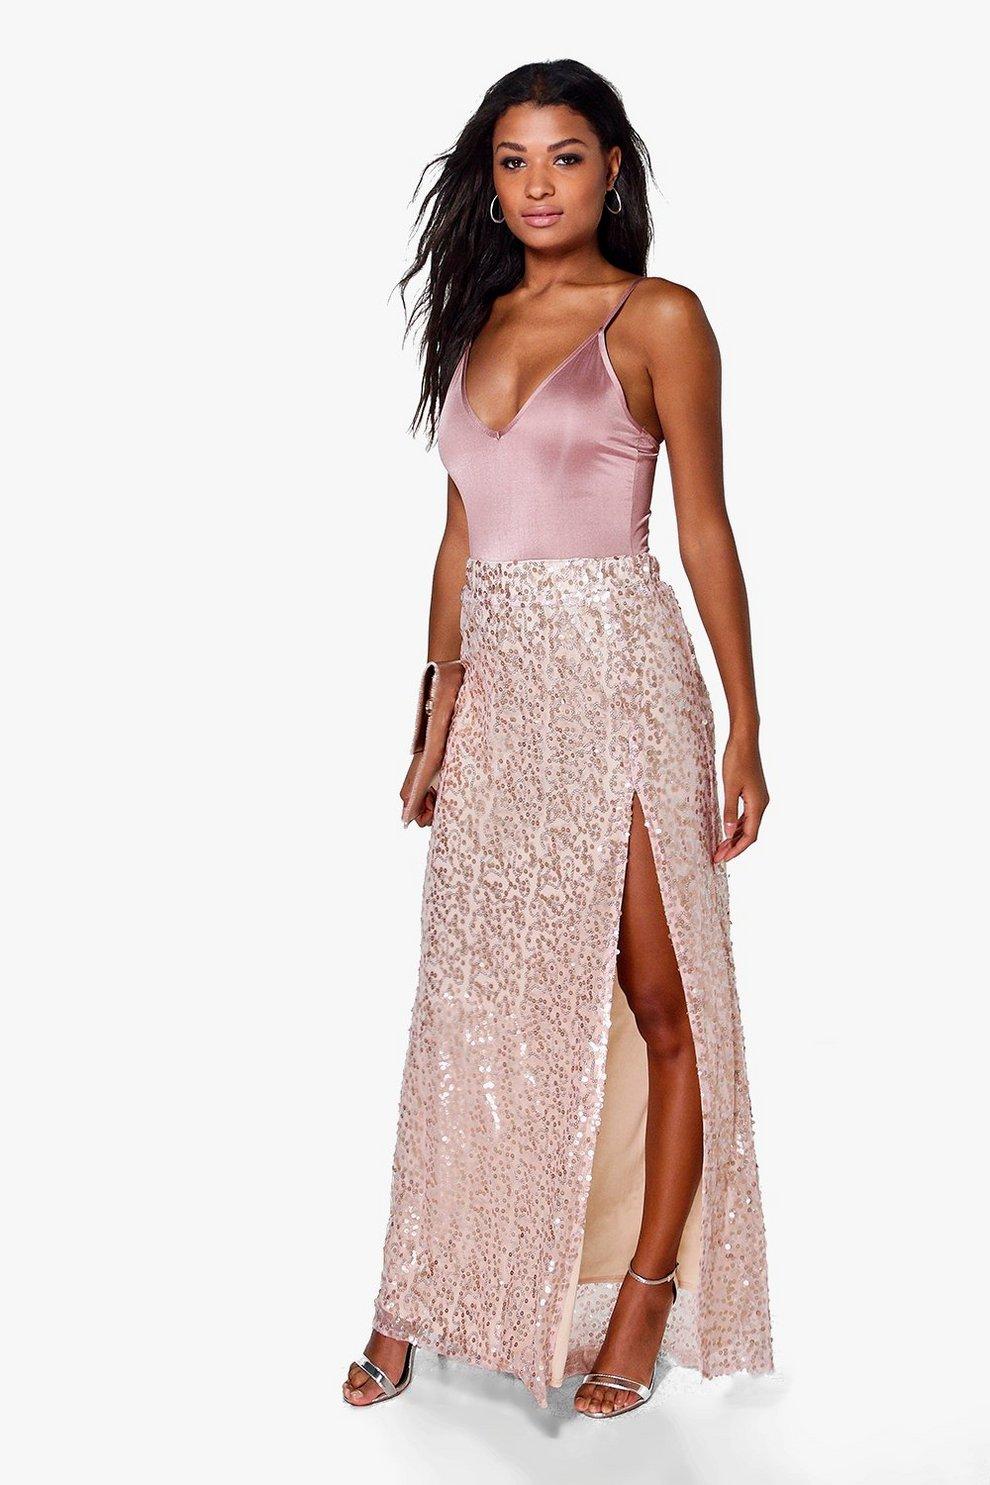 5d1cbb1b33 Boutique Lola Thigh Split Sequin Maxi Skirt   Boohoo